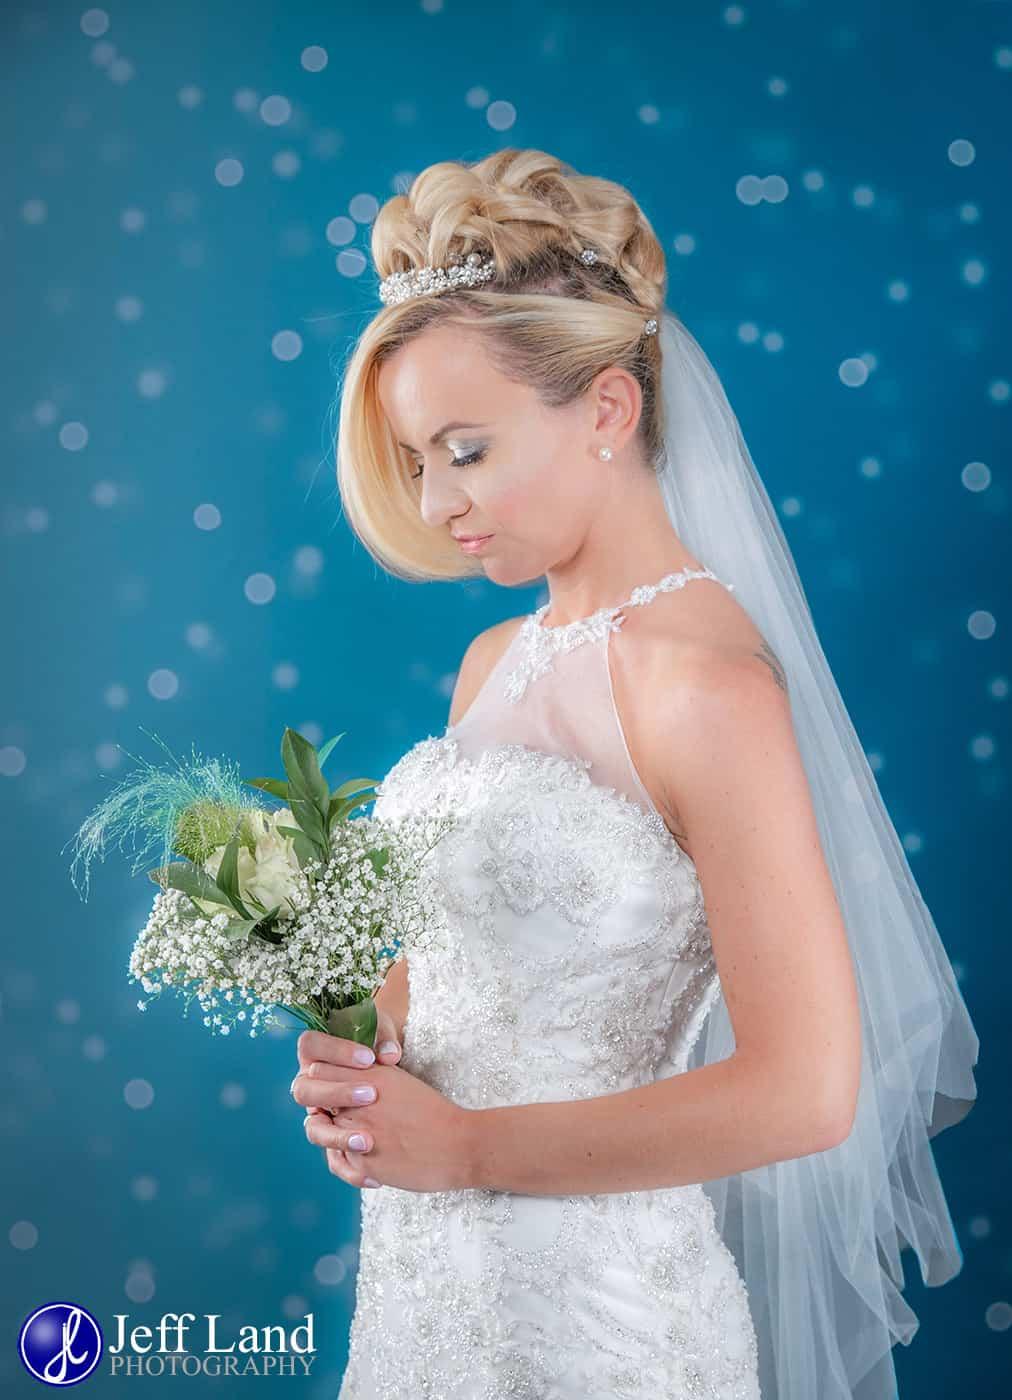 Warwickshire, Wedding, Events, Photographer, Warwick, Stratford-upon-Avon, Leamington Spa, Stratford upon Avon, Photographer Warwickshire, Warwickshire Wedding Photographer